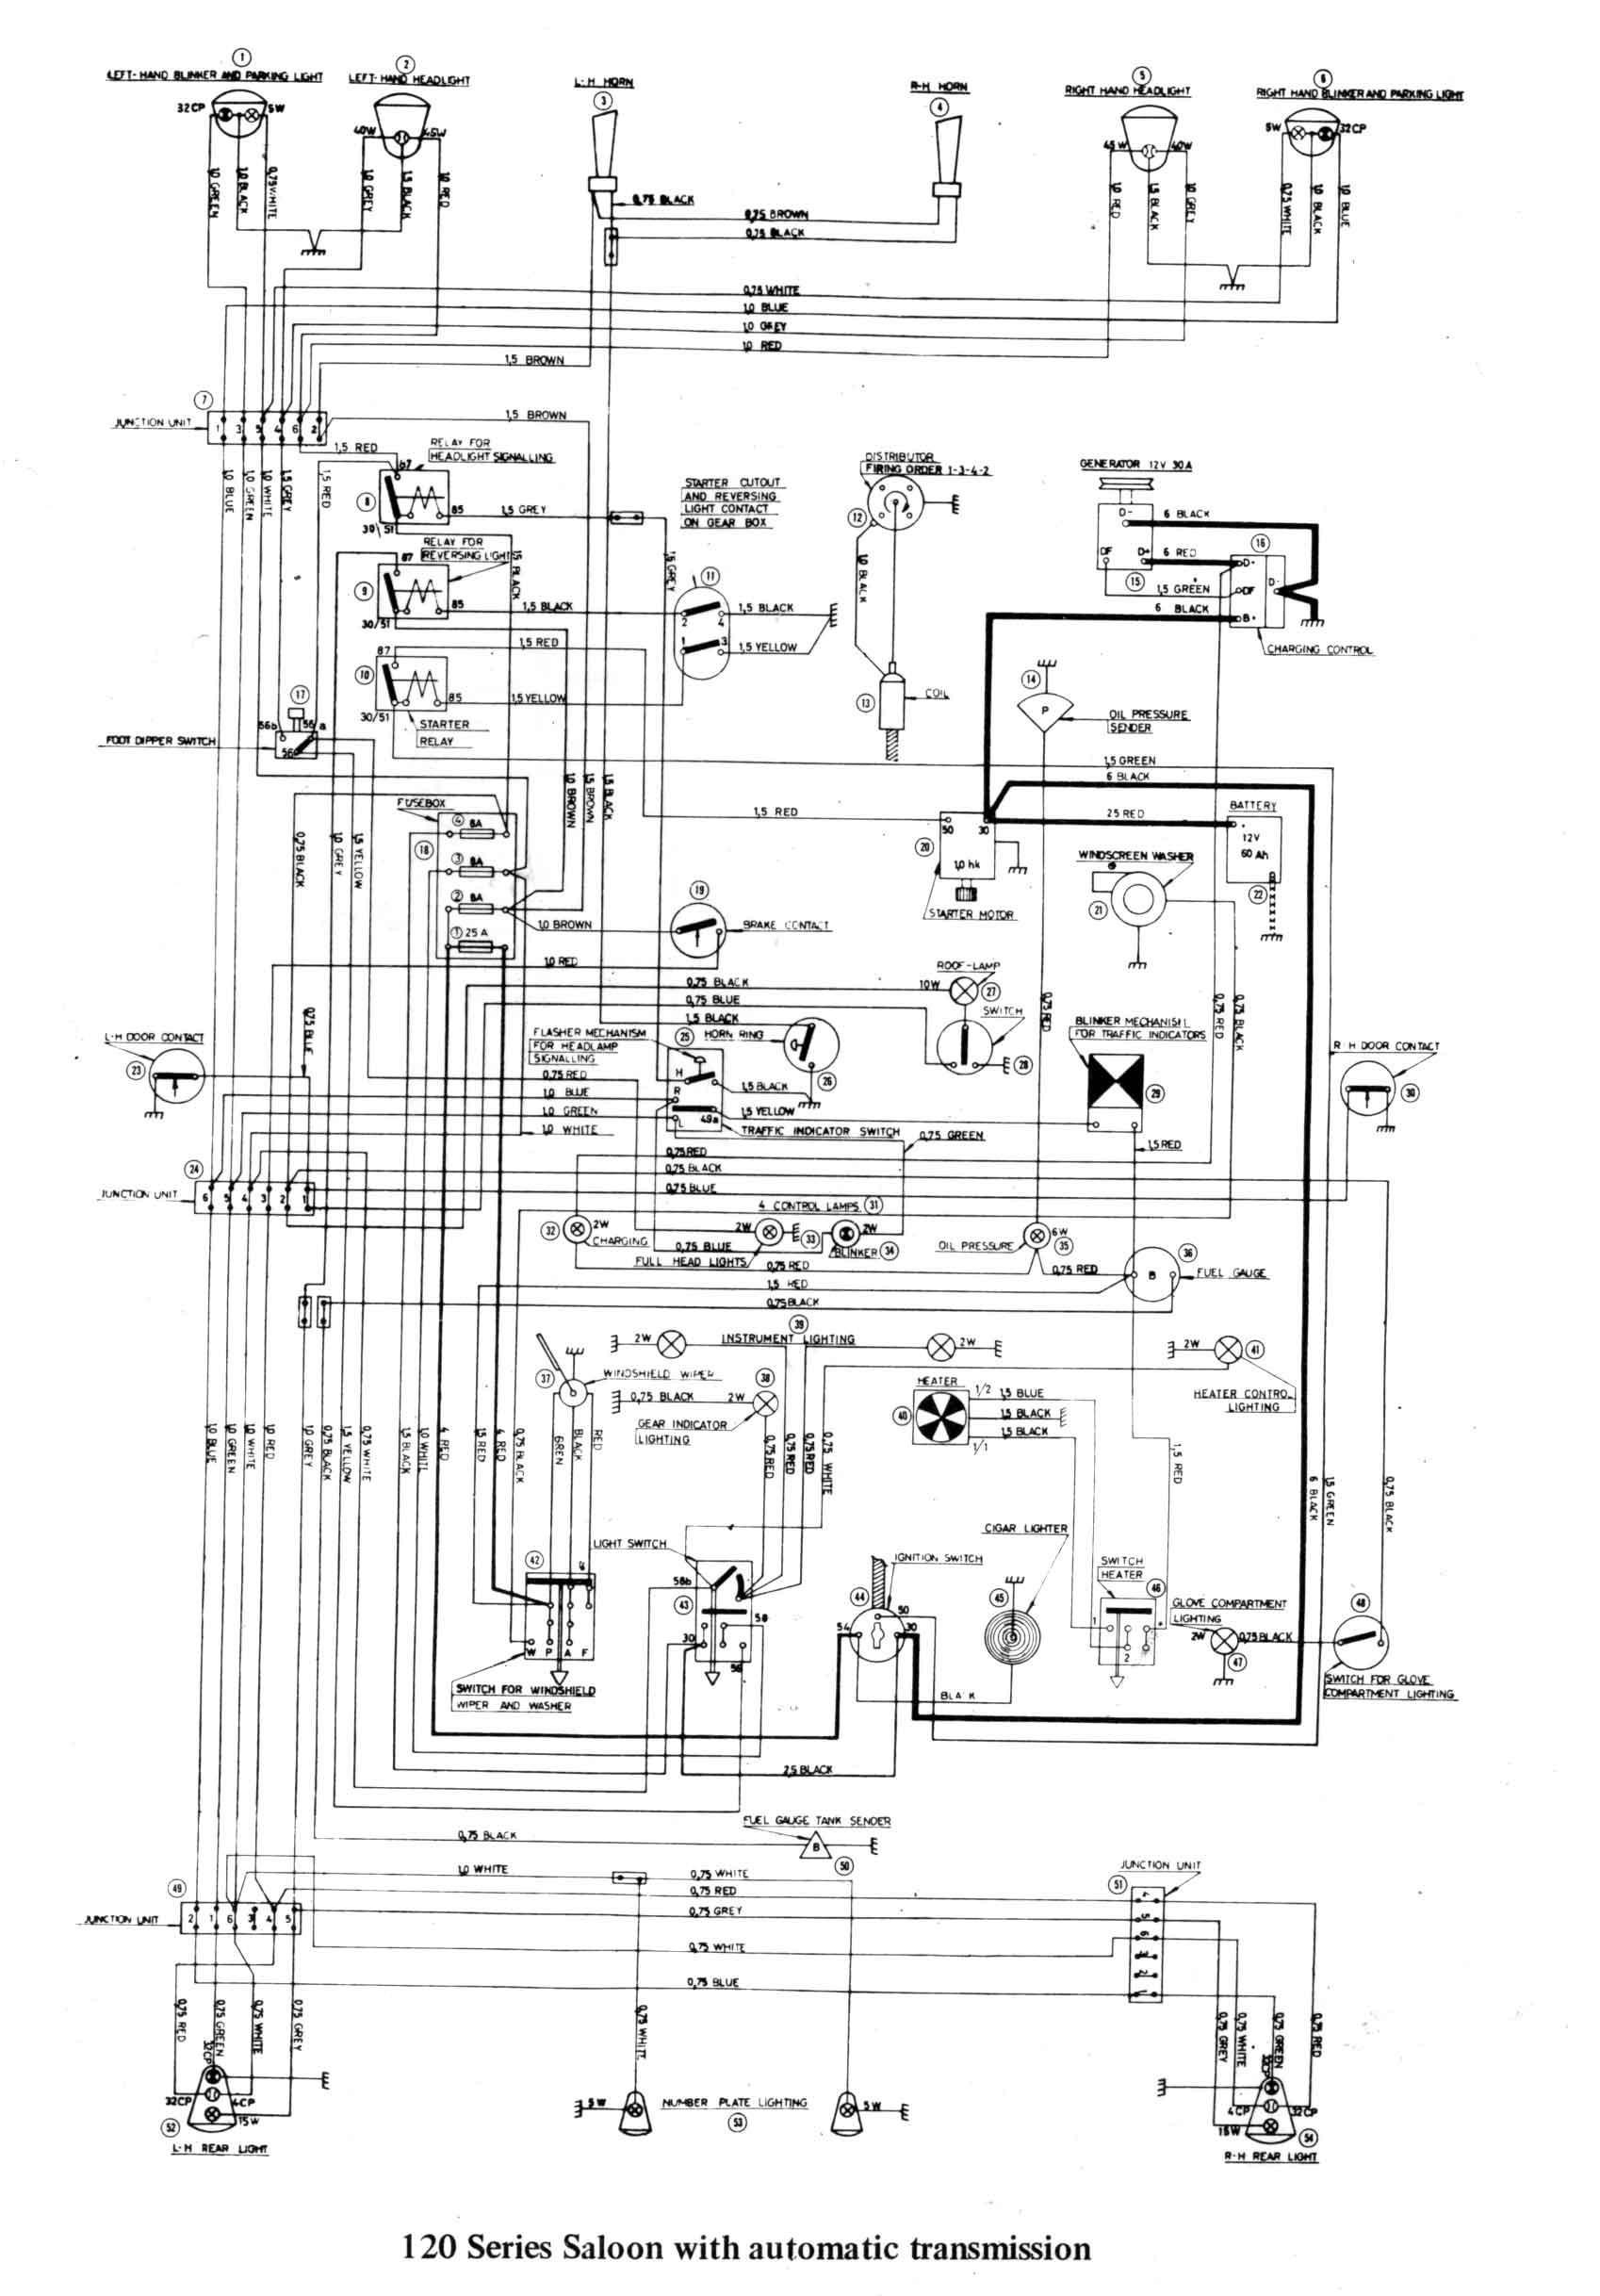 Free Wiring Diagrams for Dodge Trucks Free Downloads Schematic Diagram  Alternator Wiring Inspirationa Sw Em Od